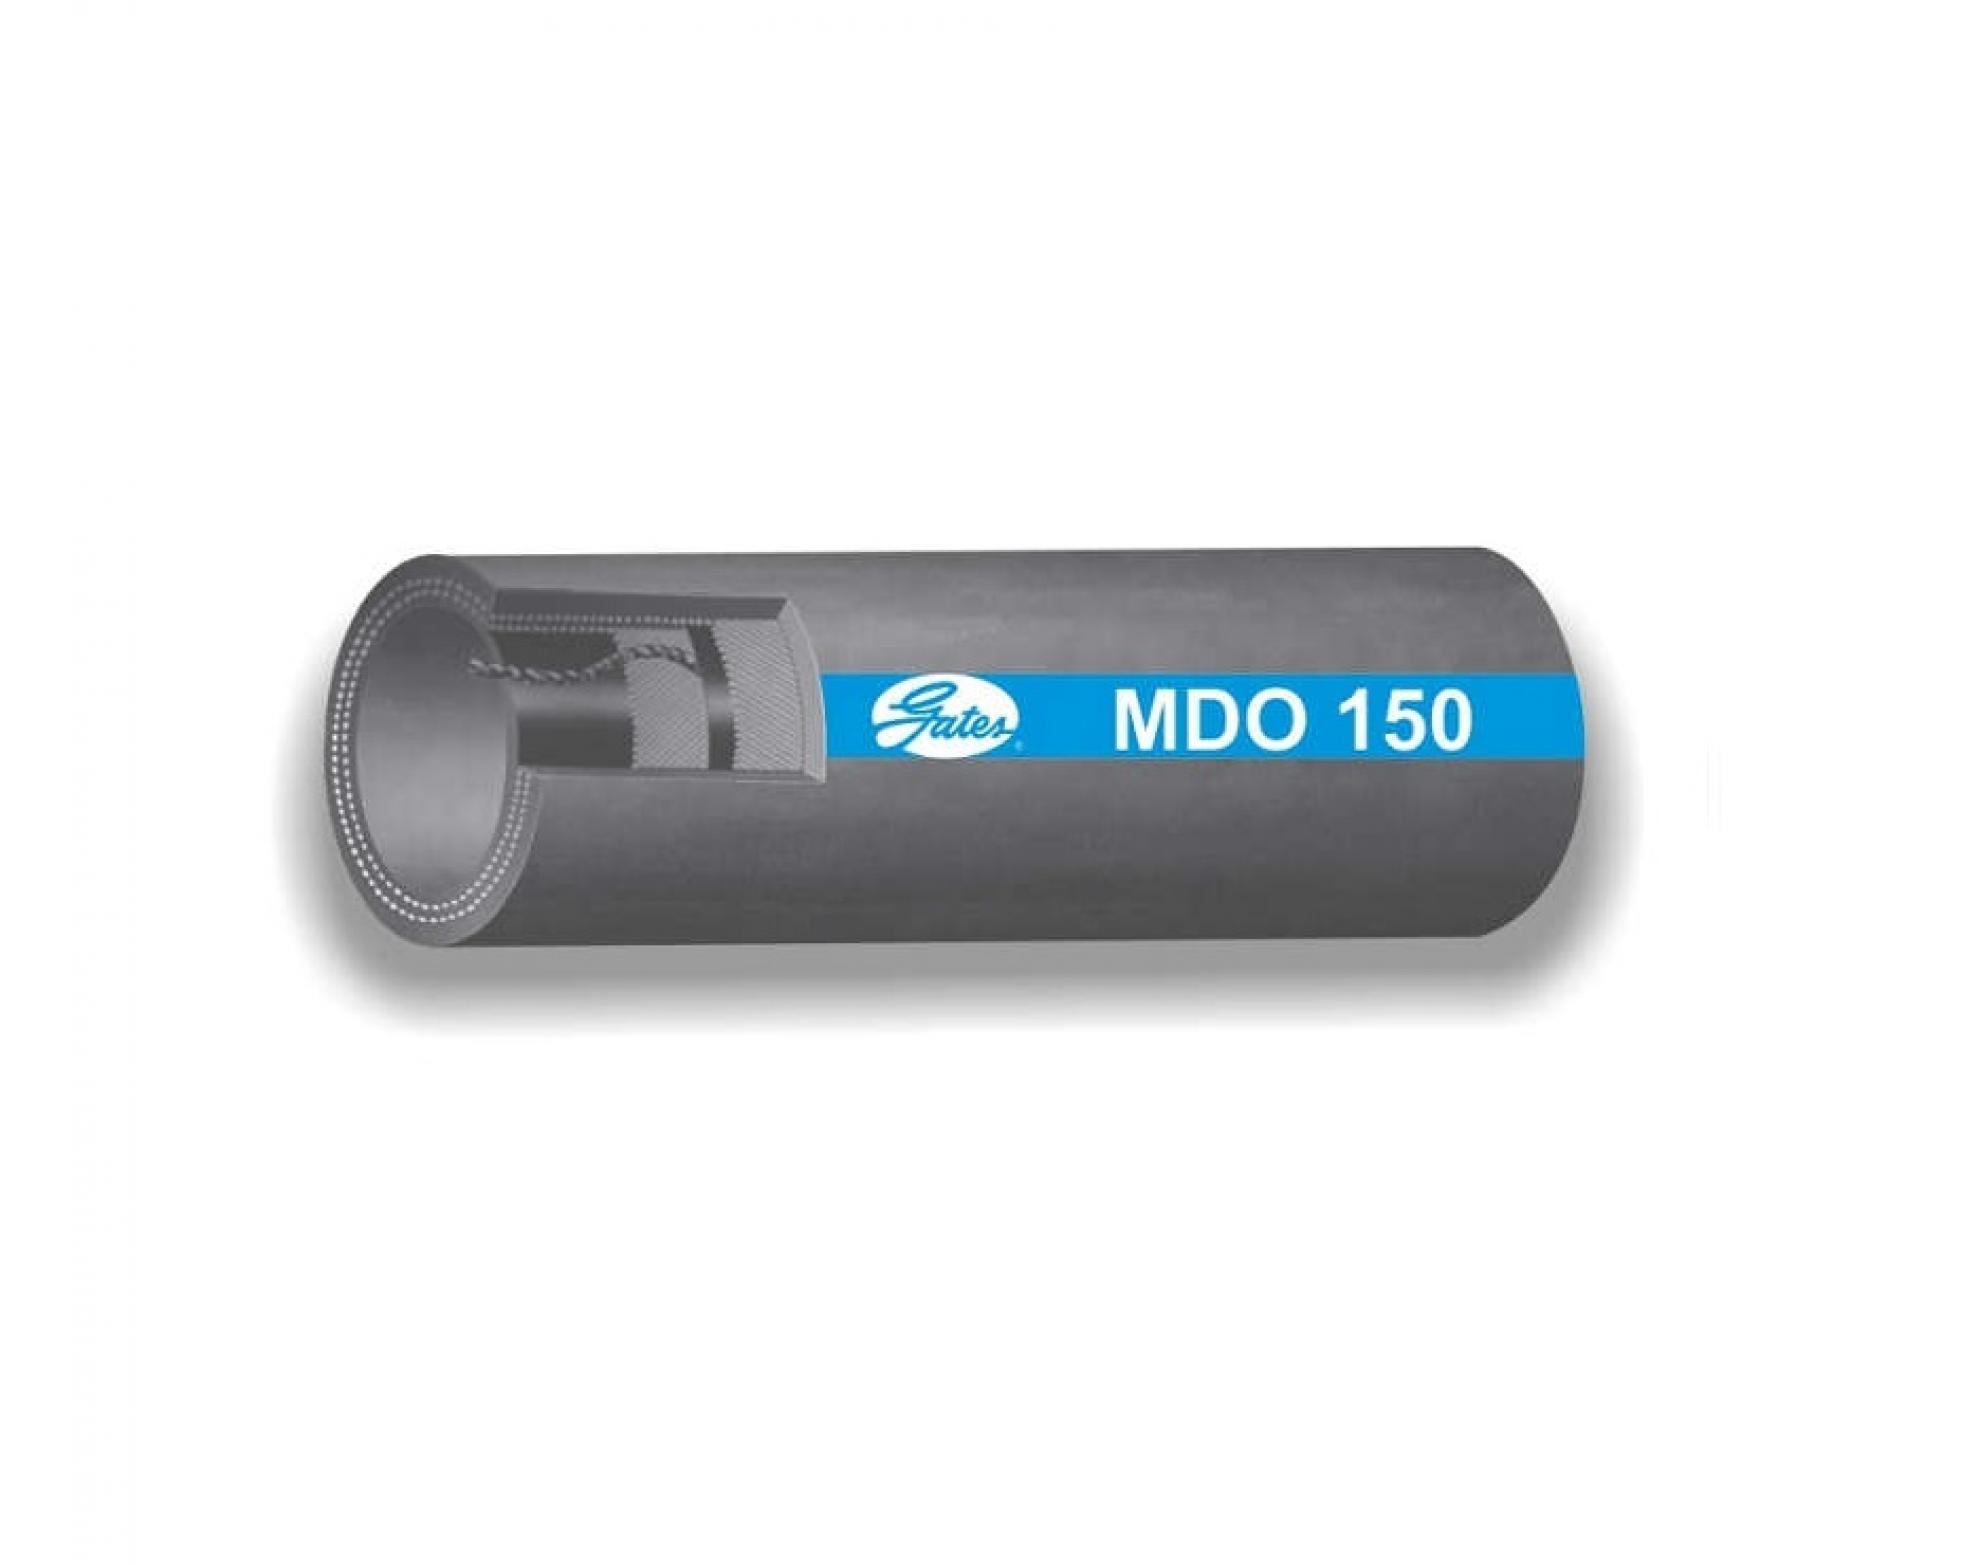 MANGUEIRAS INDUSTRIAIS MDO 150